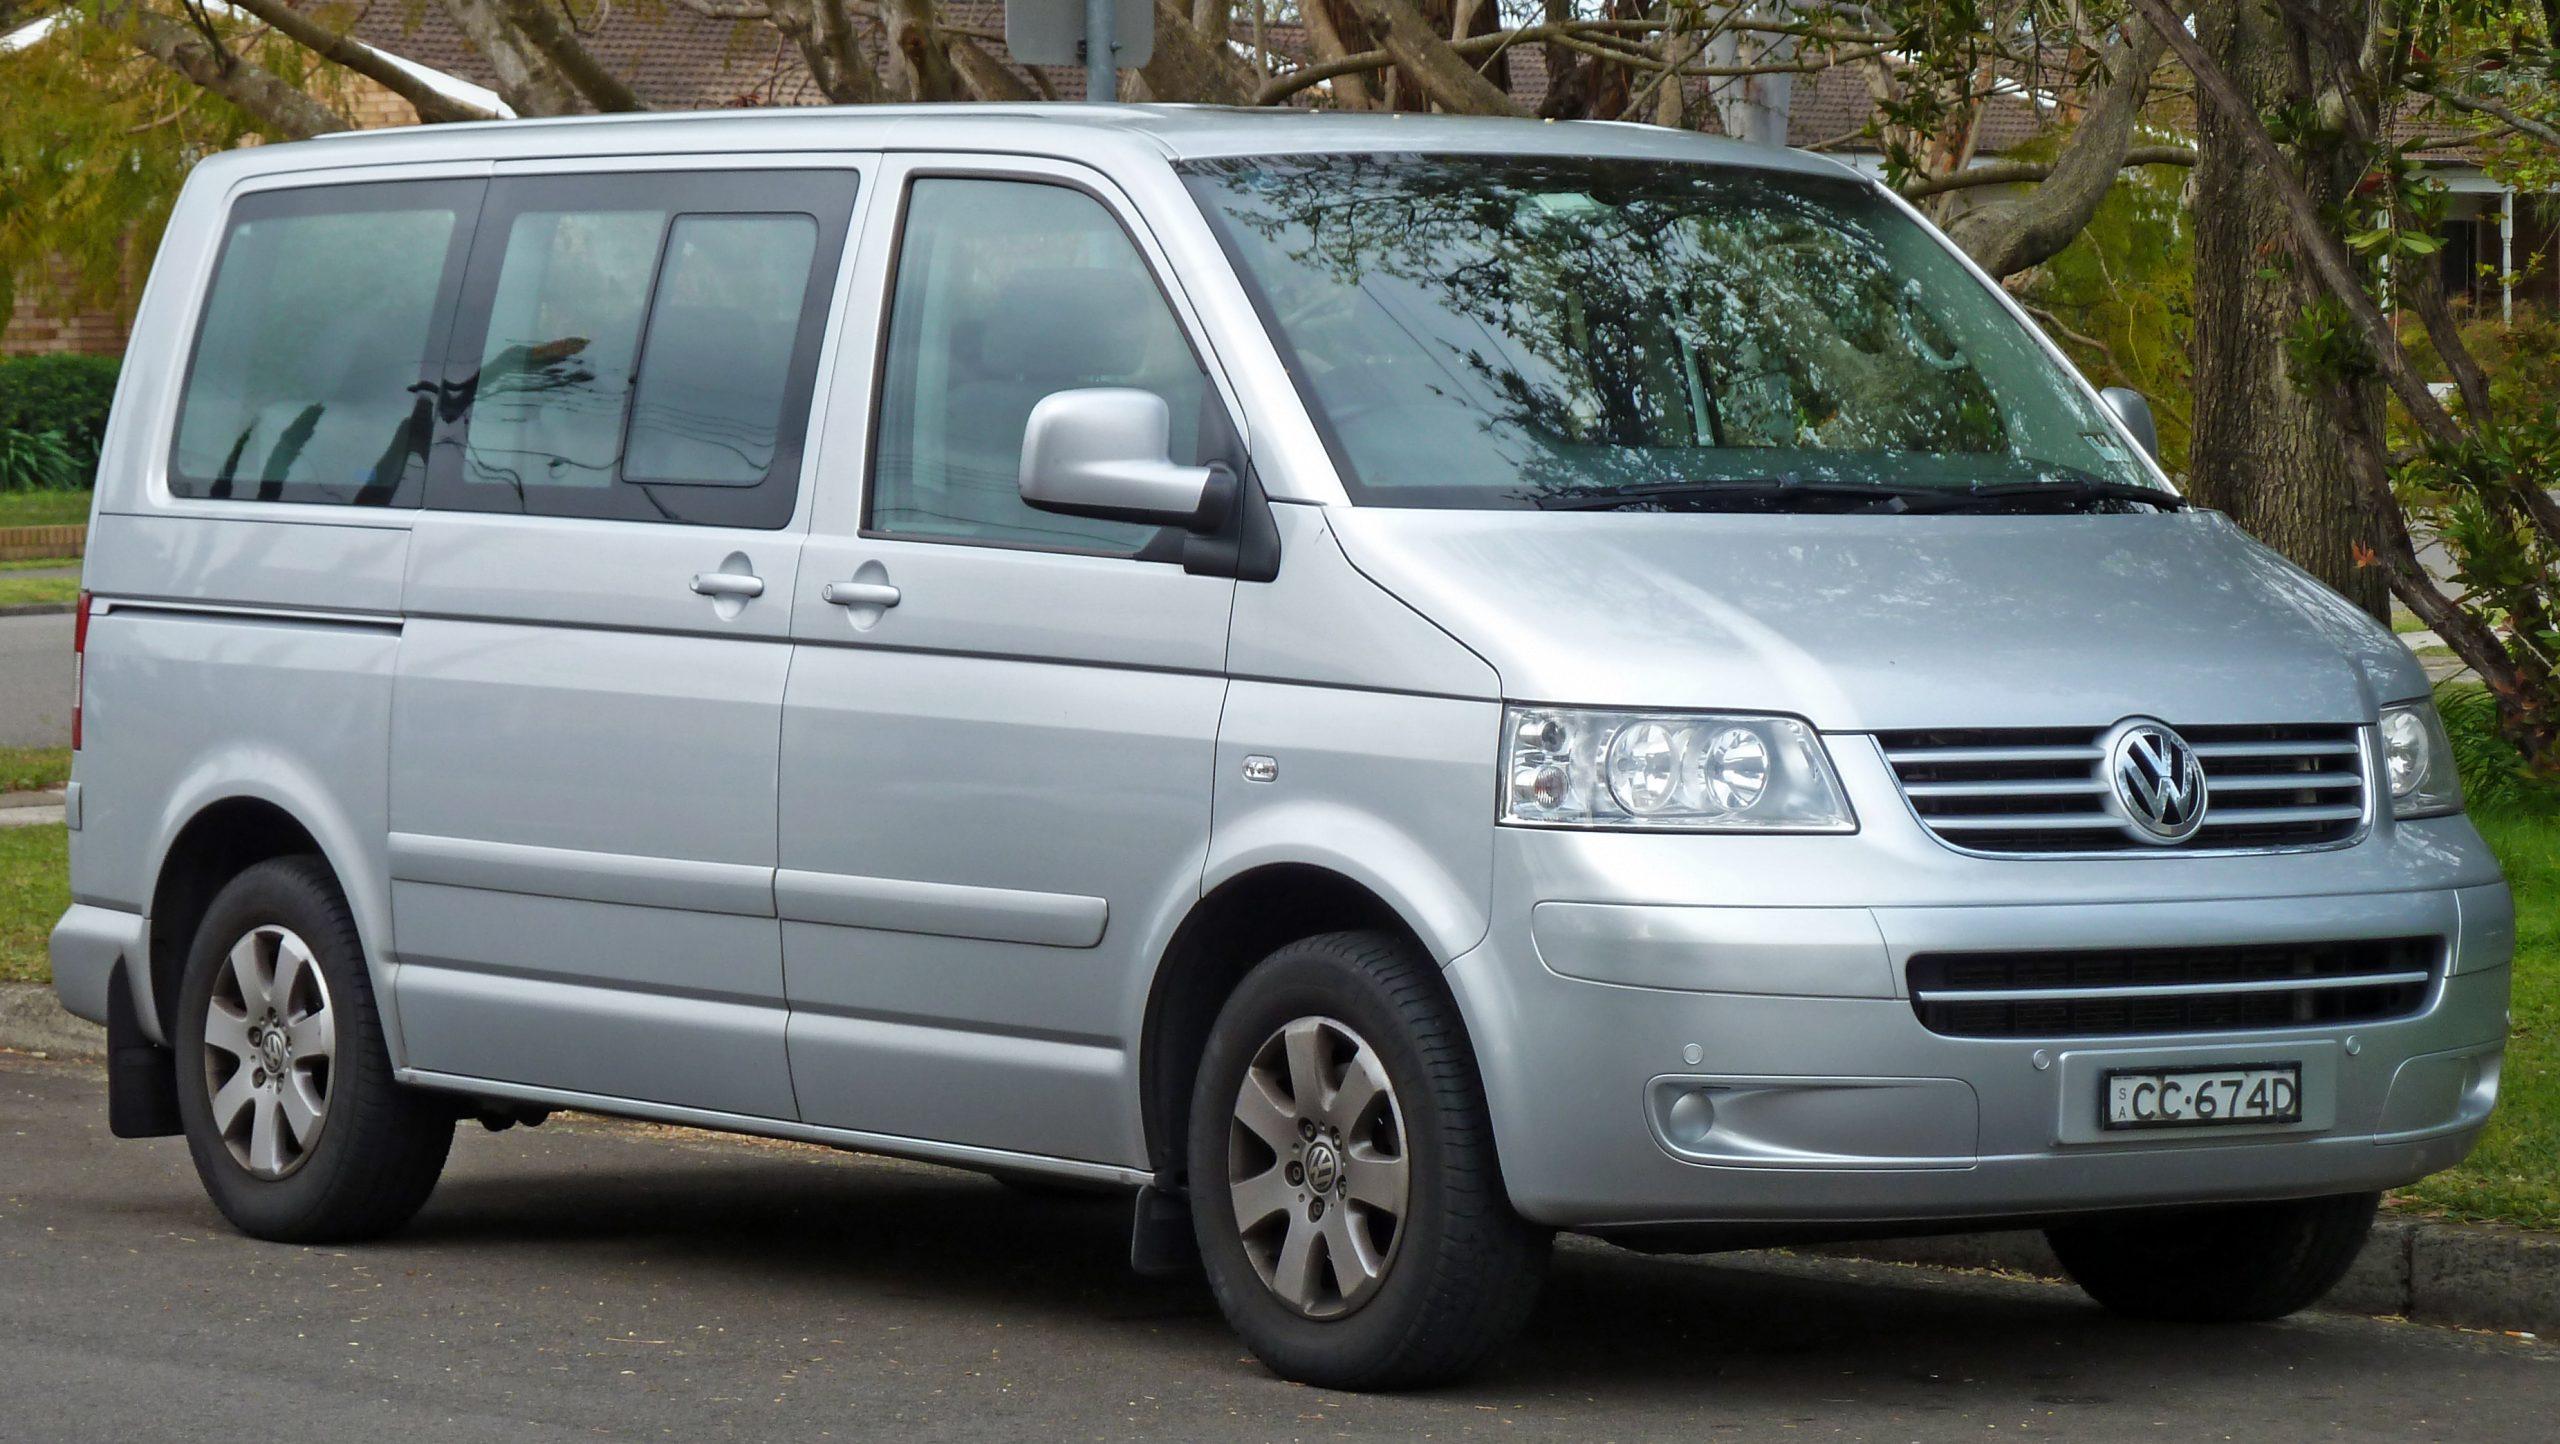 Is this silver Volkswagen transporter the best van for camper conversion